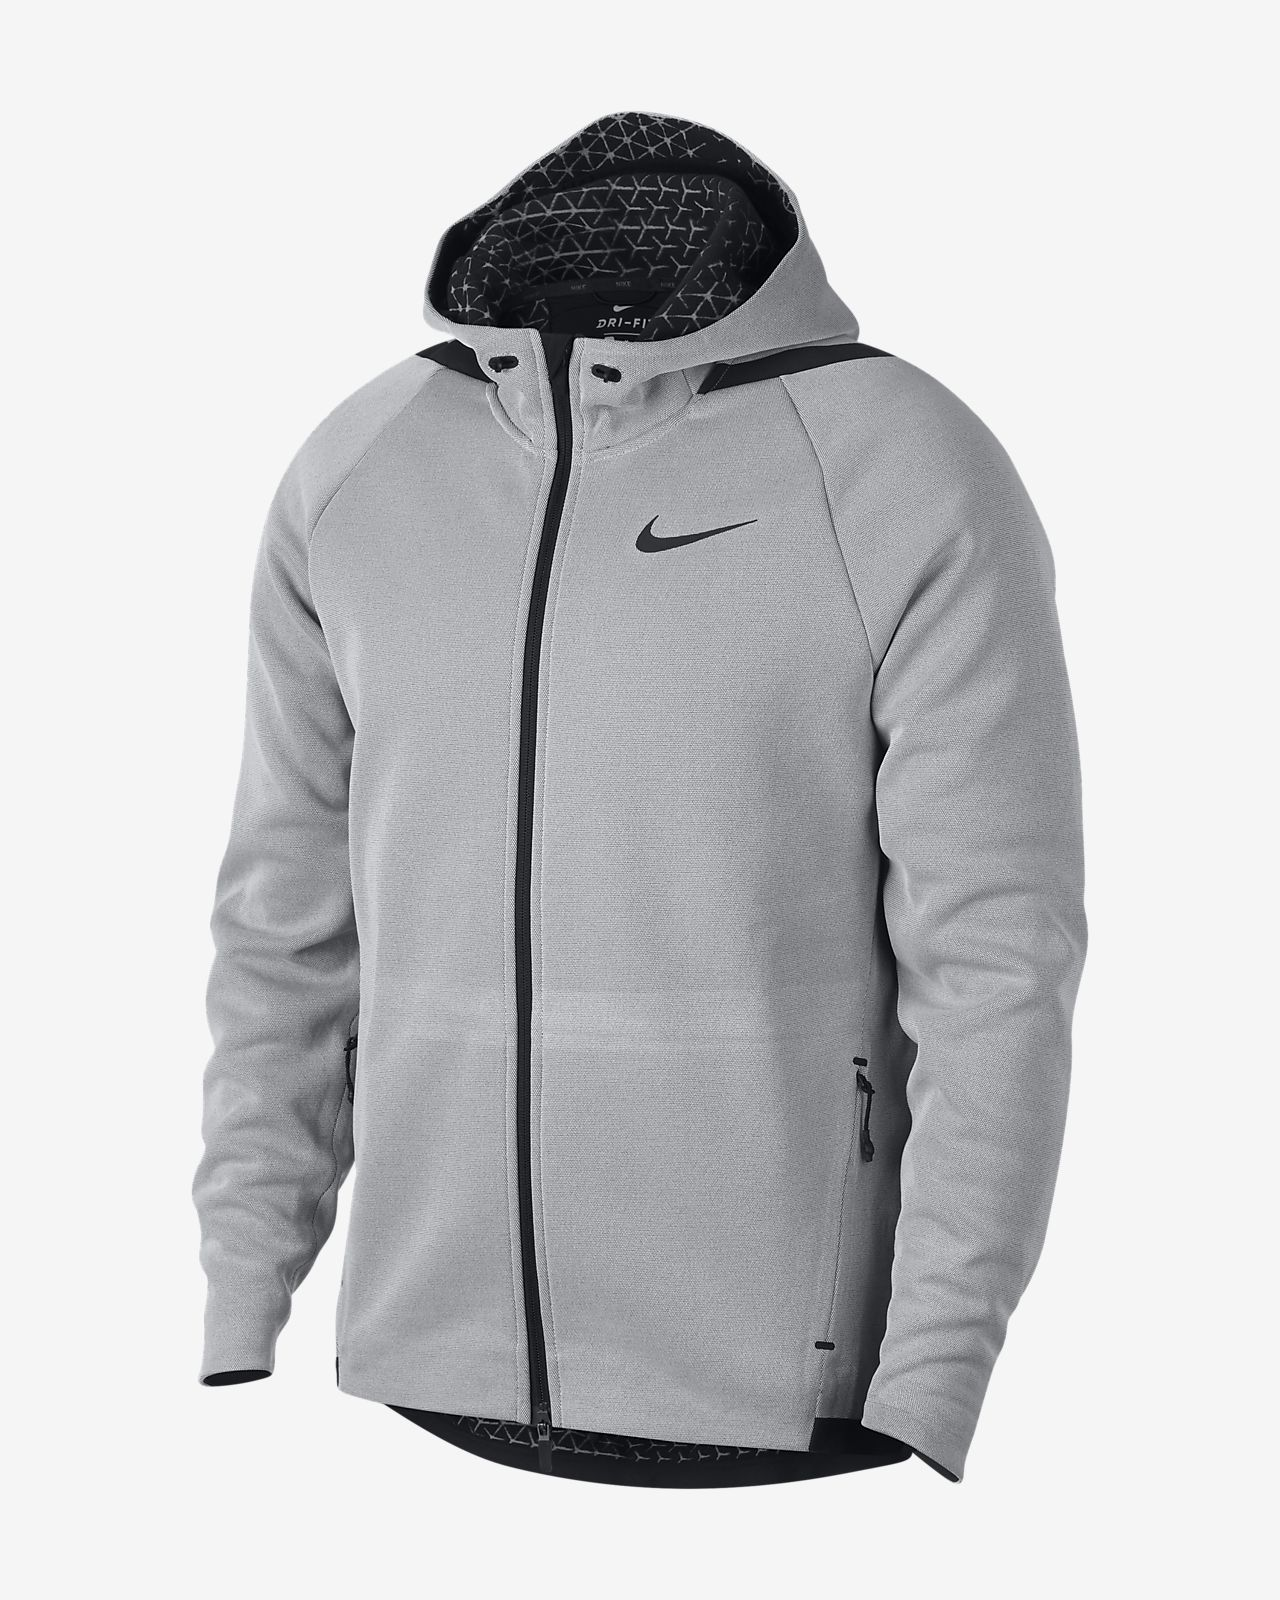 Nike Therma-Sphere Men's Training Jacket